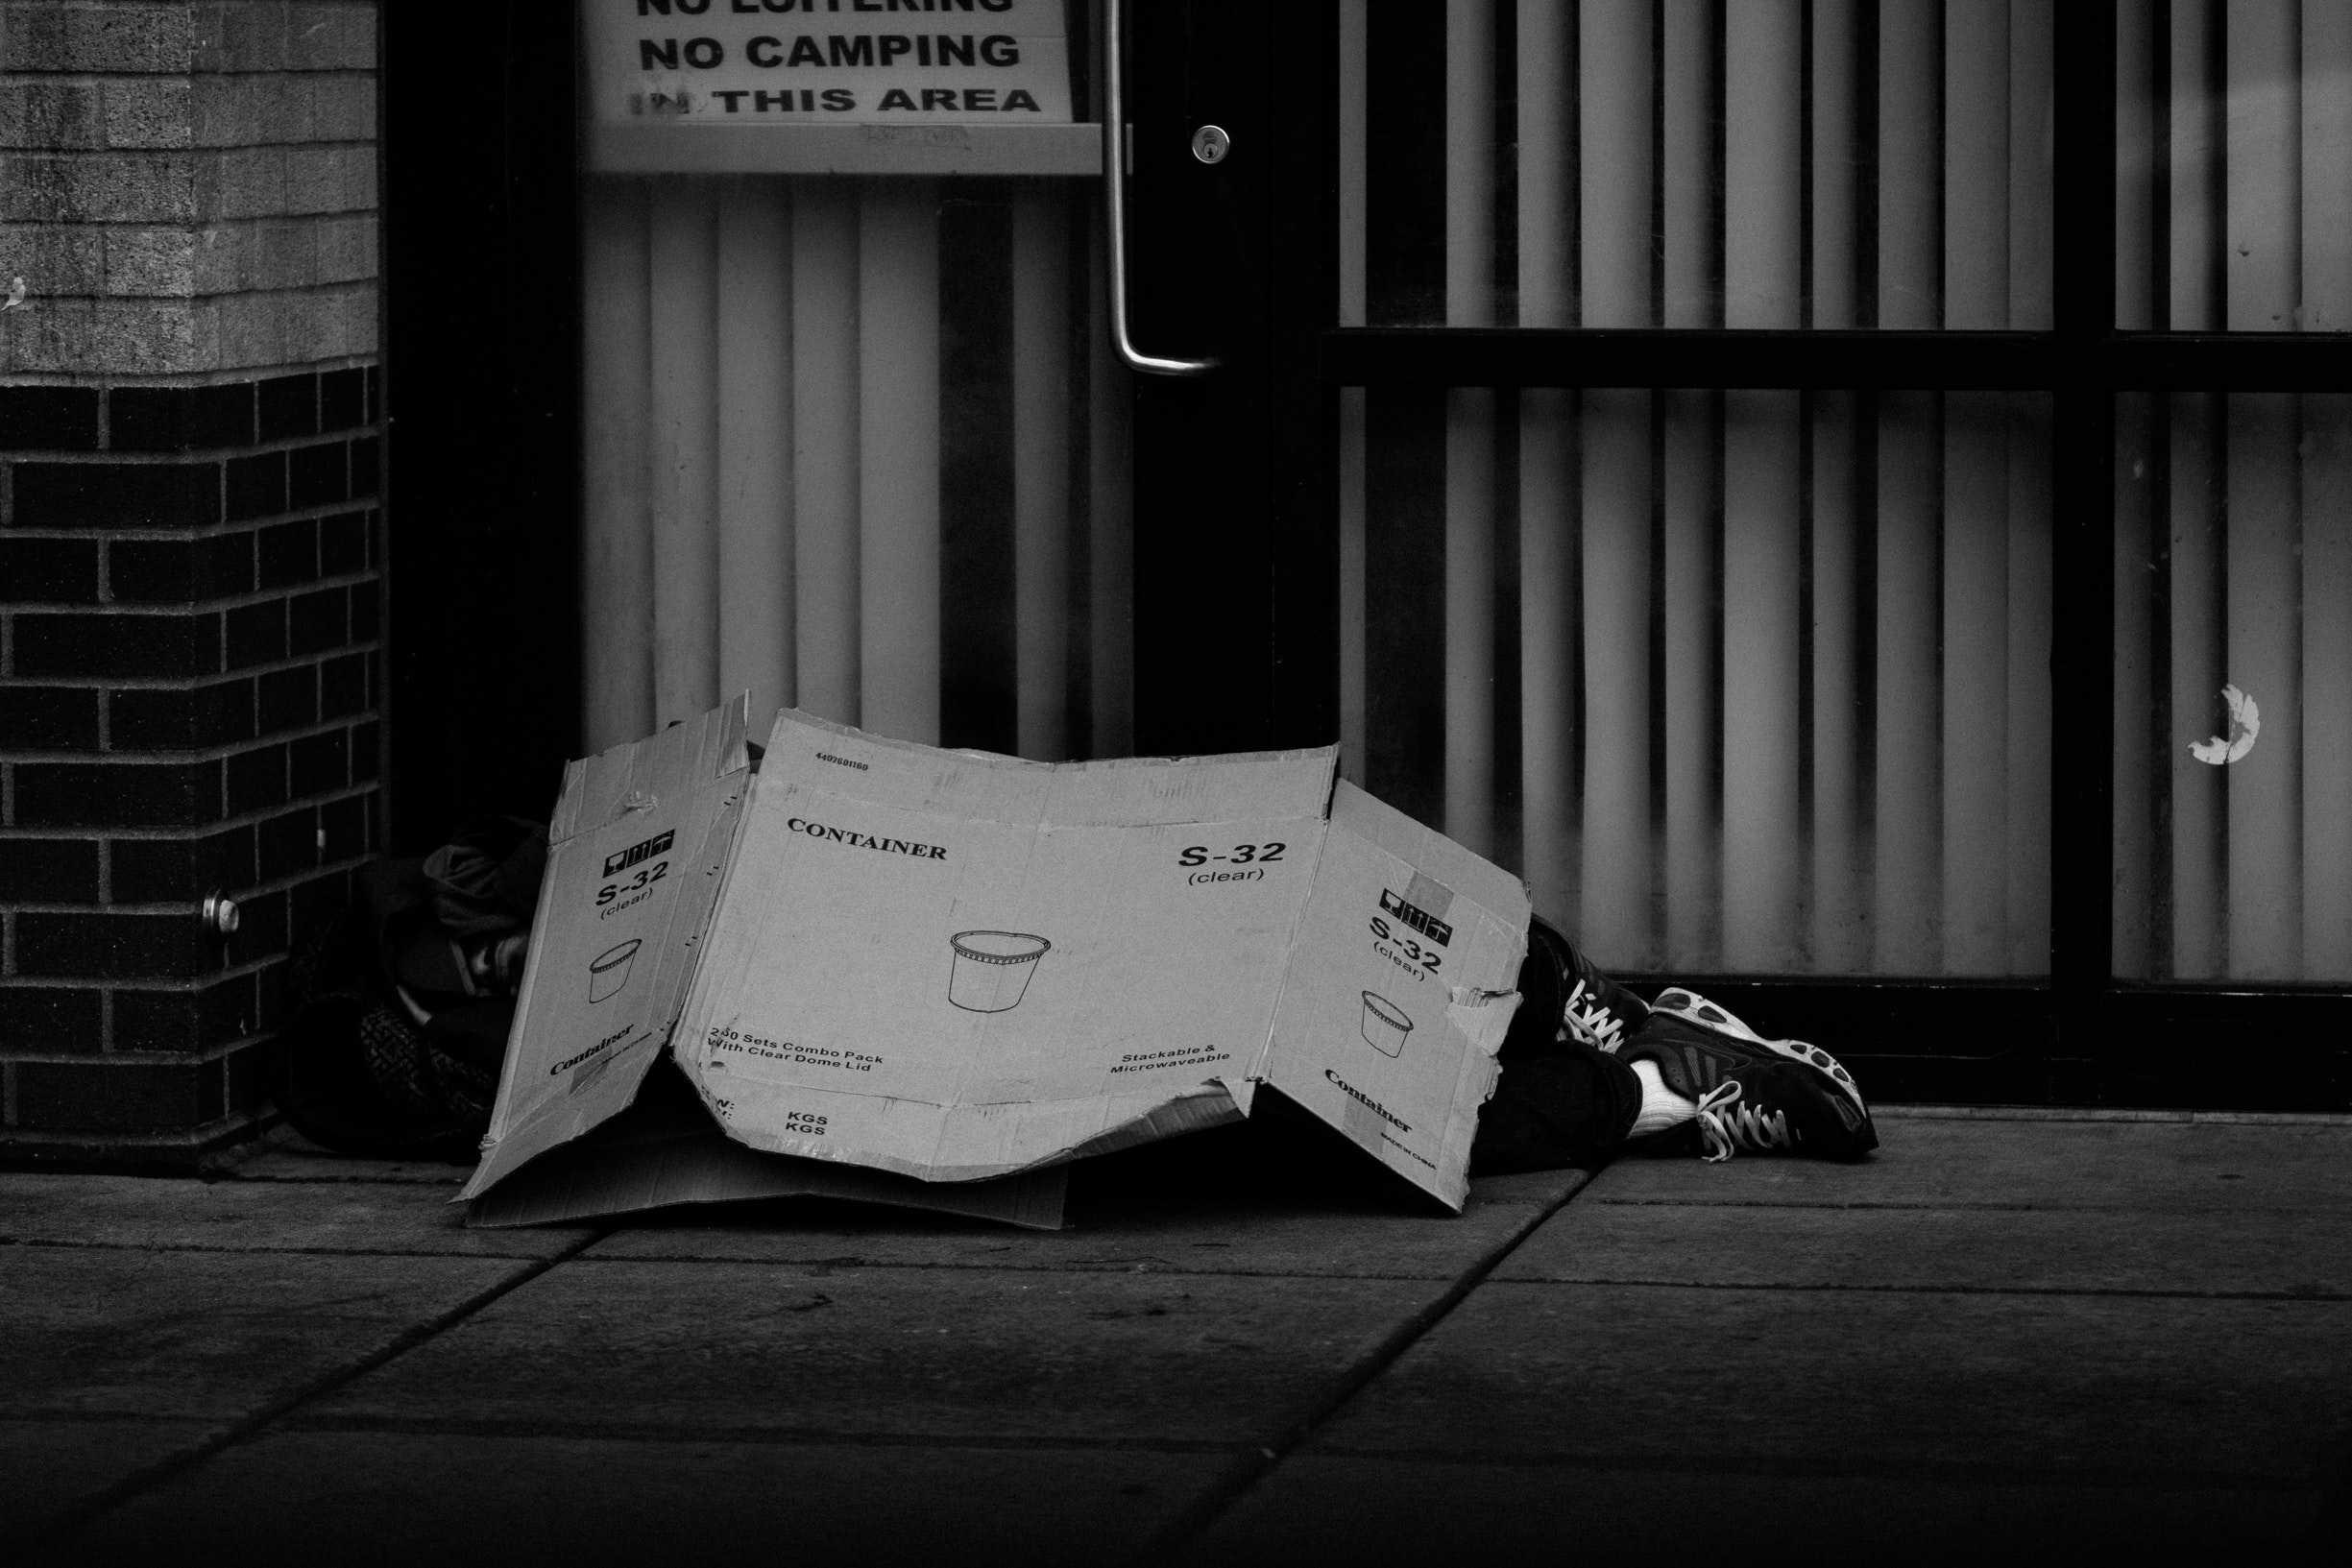 man sleeping under cardboard